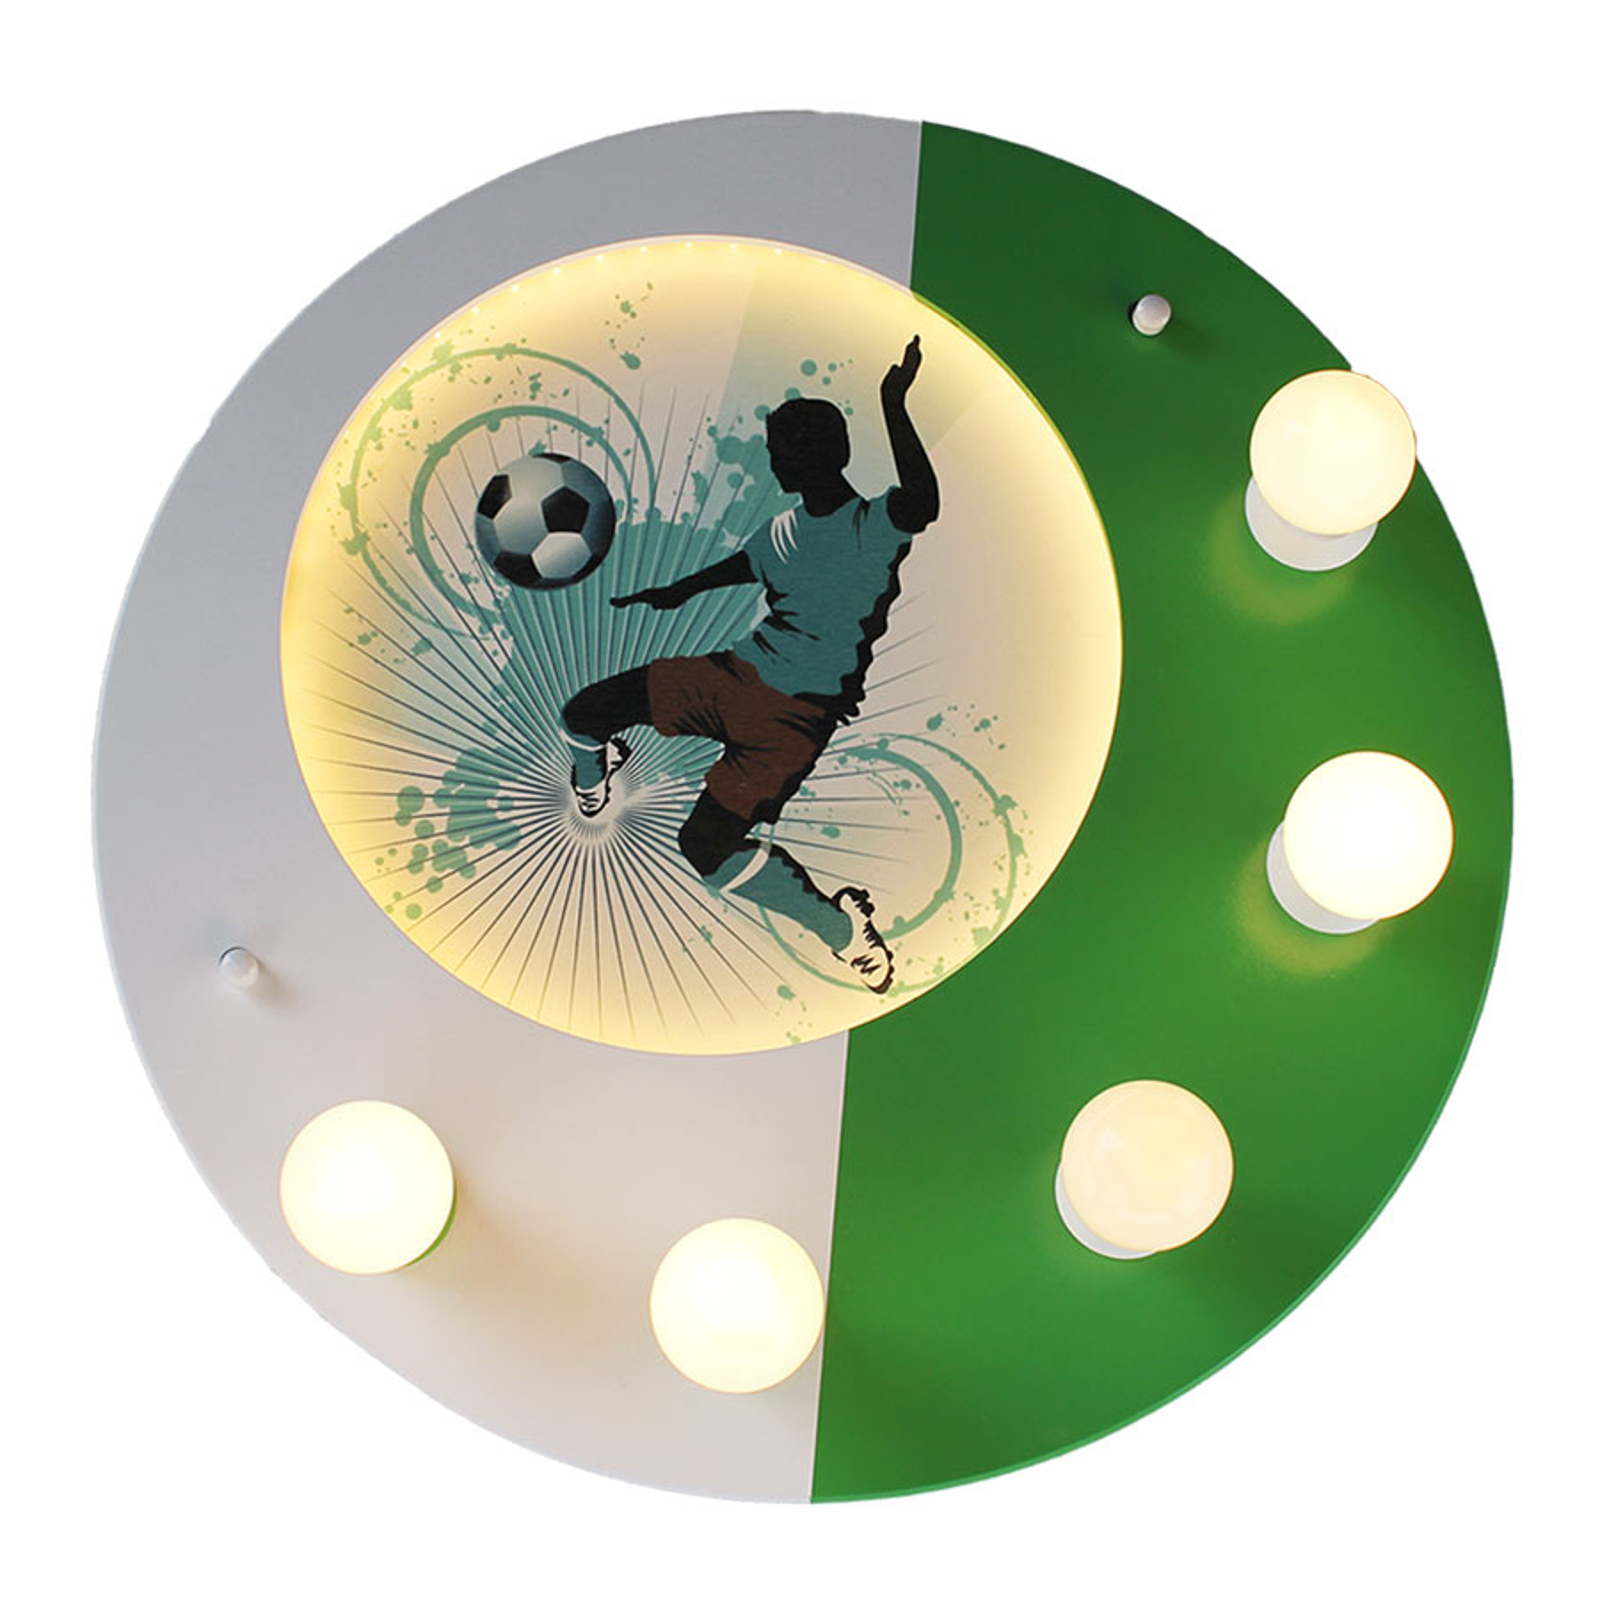 Plafonnier Football, 5 lampes, vert-blanc